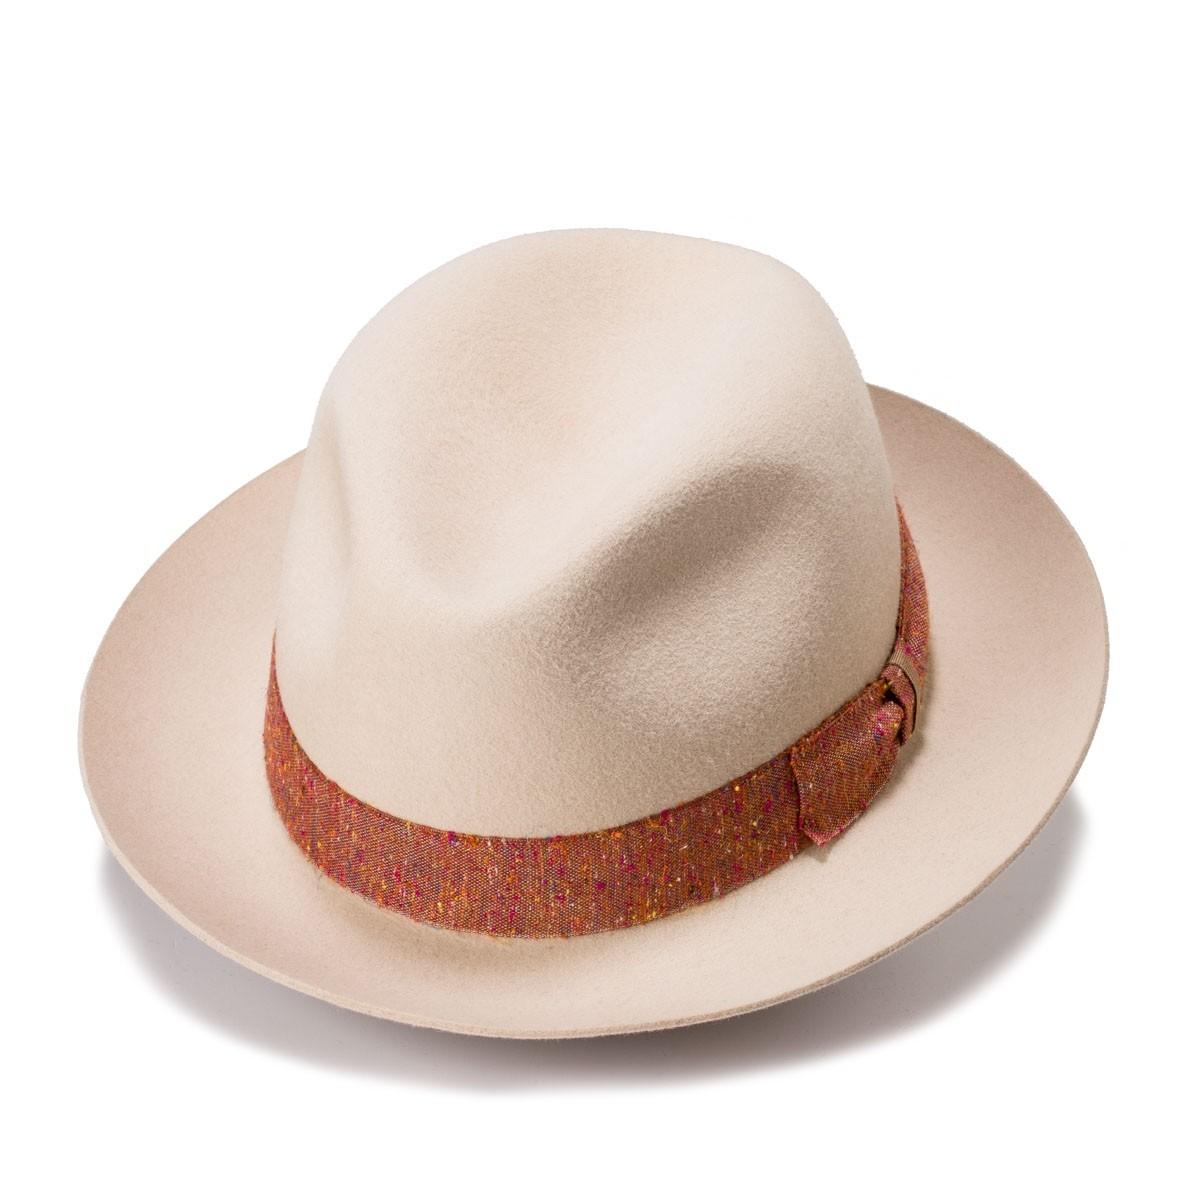 Laval Otter Fedora style fur felt hat. Fernandez y Roche